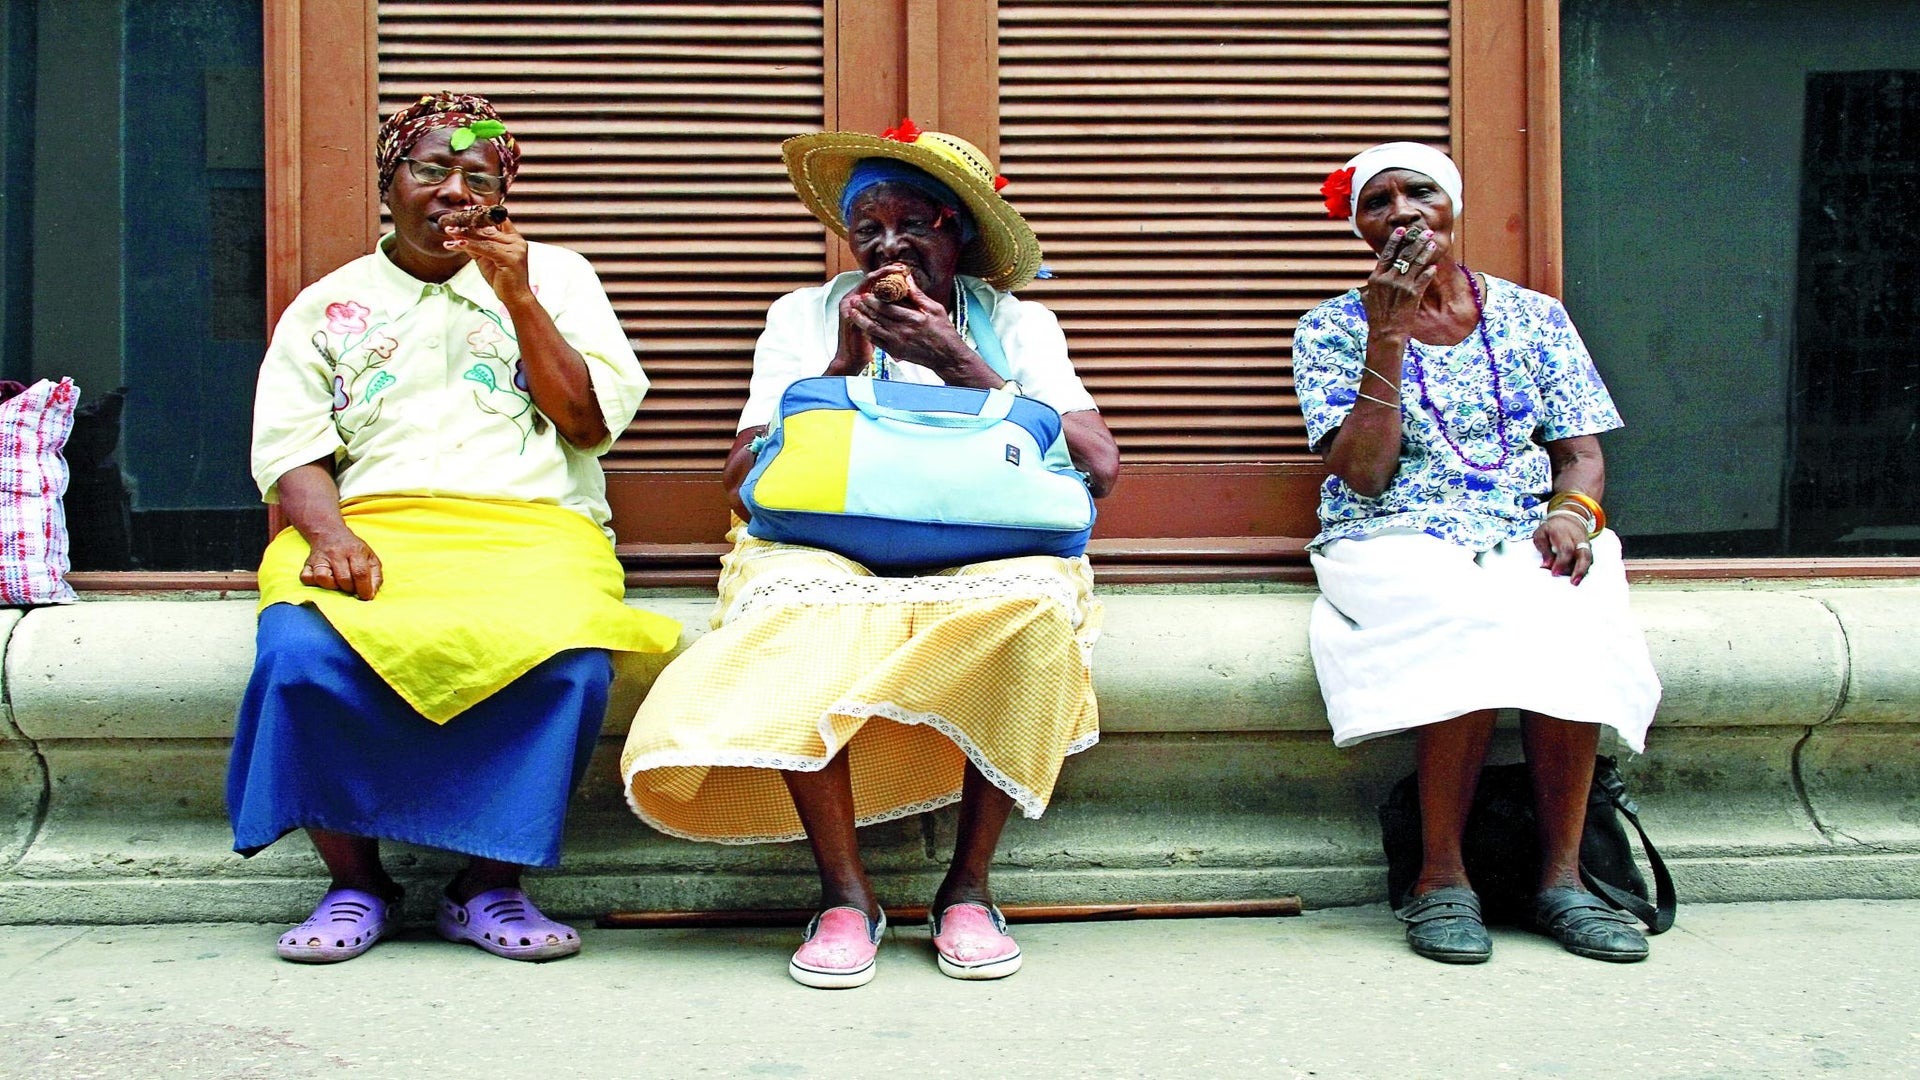 It's A New Era For Afro-Cubans